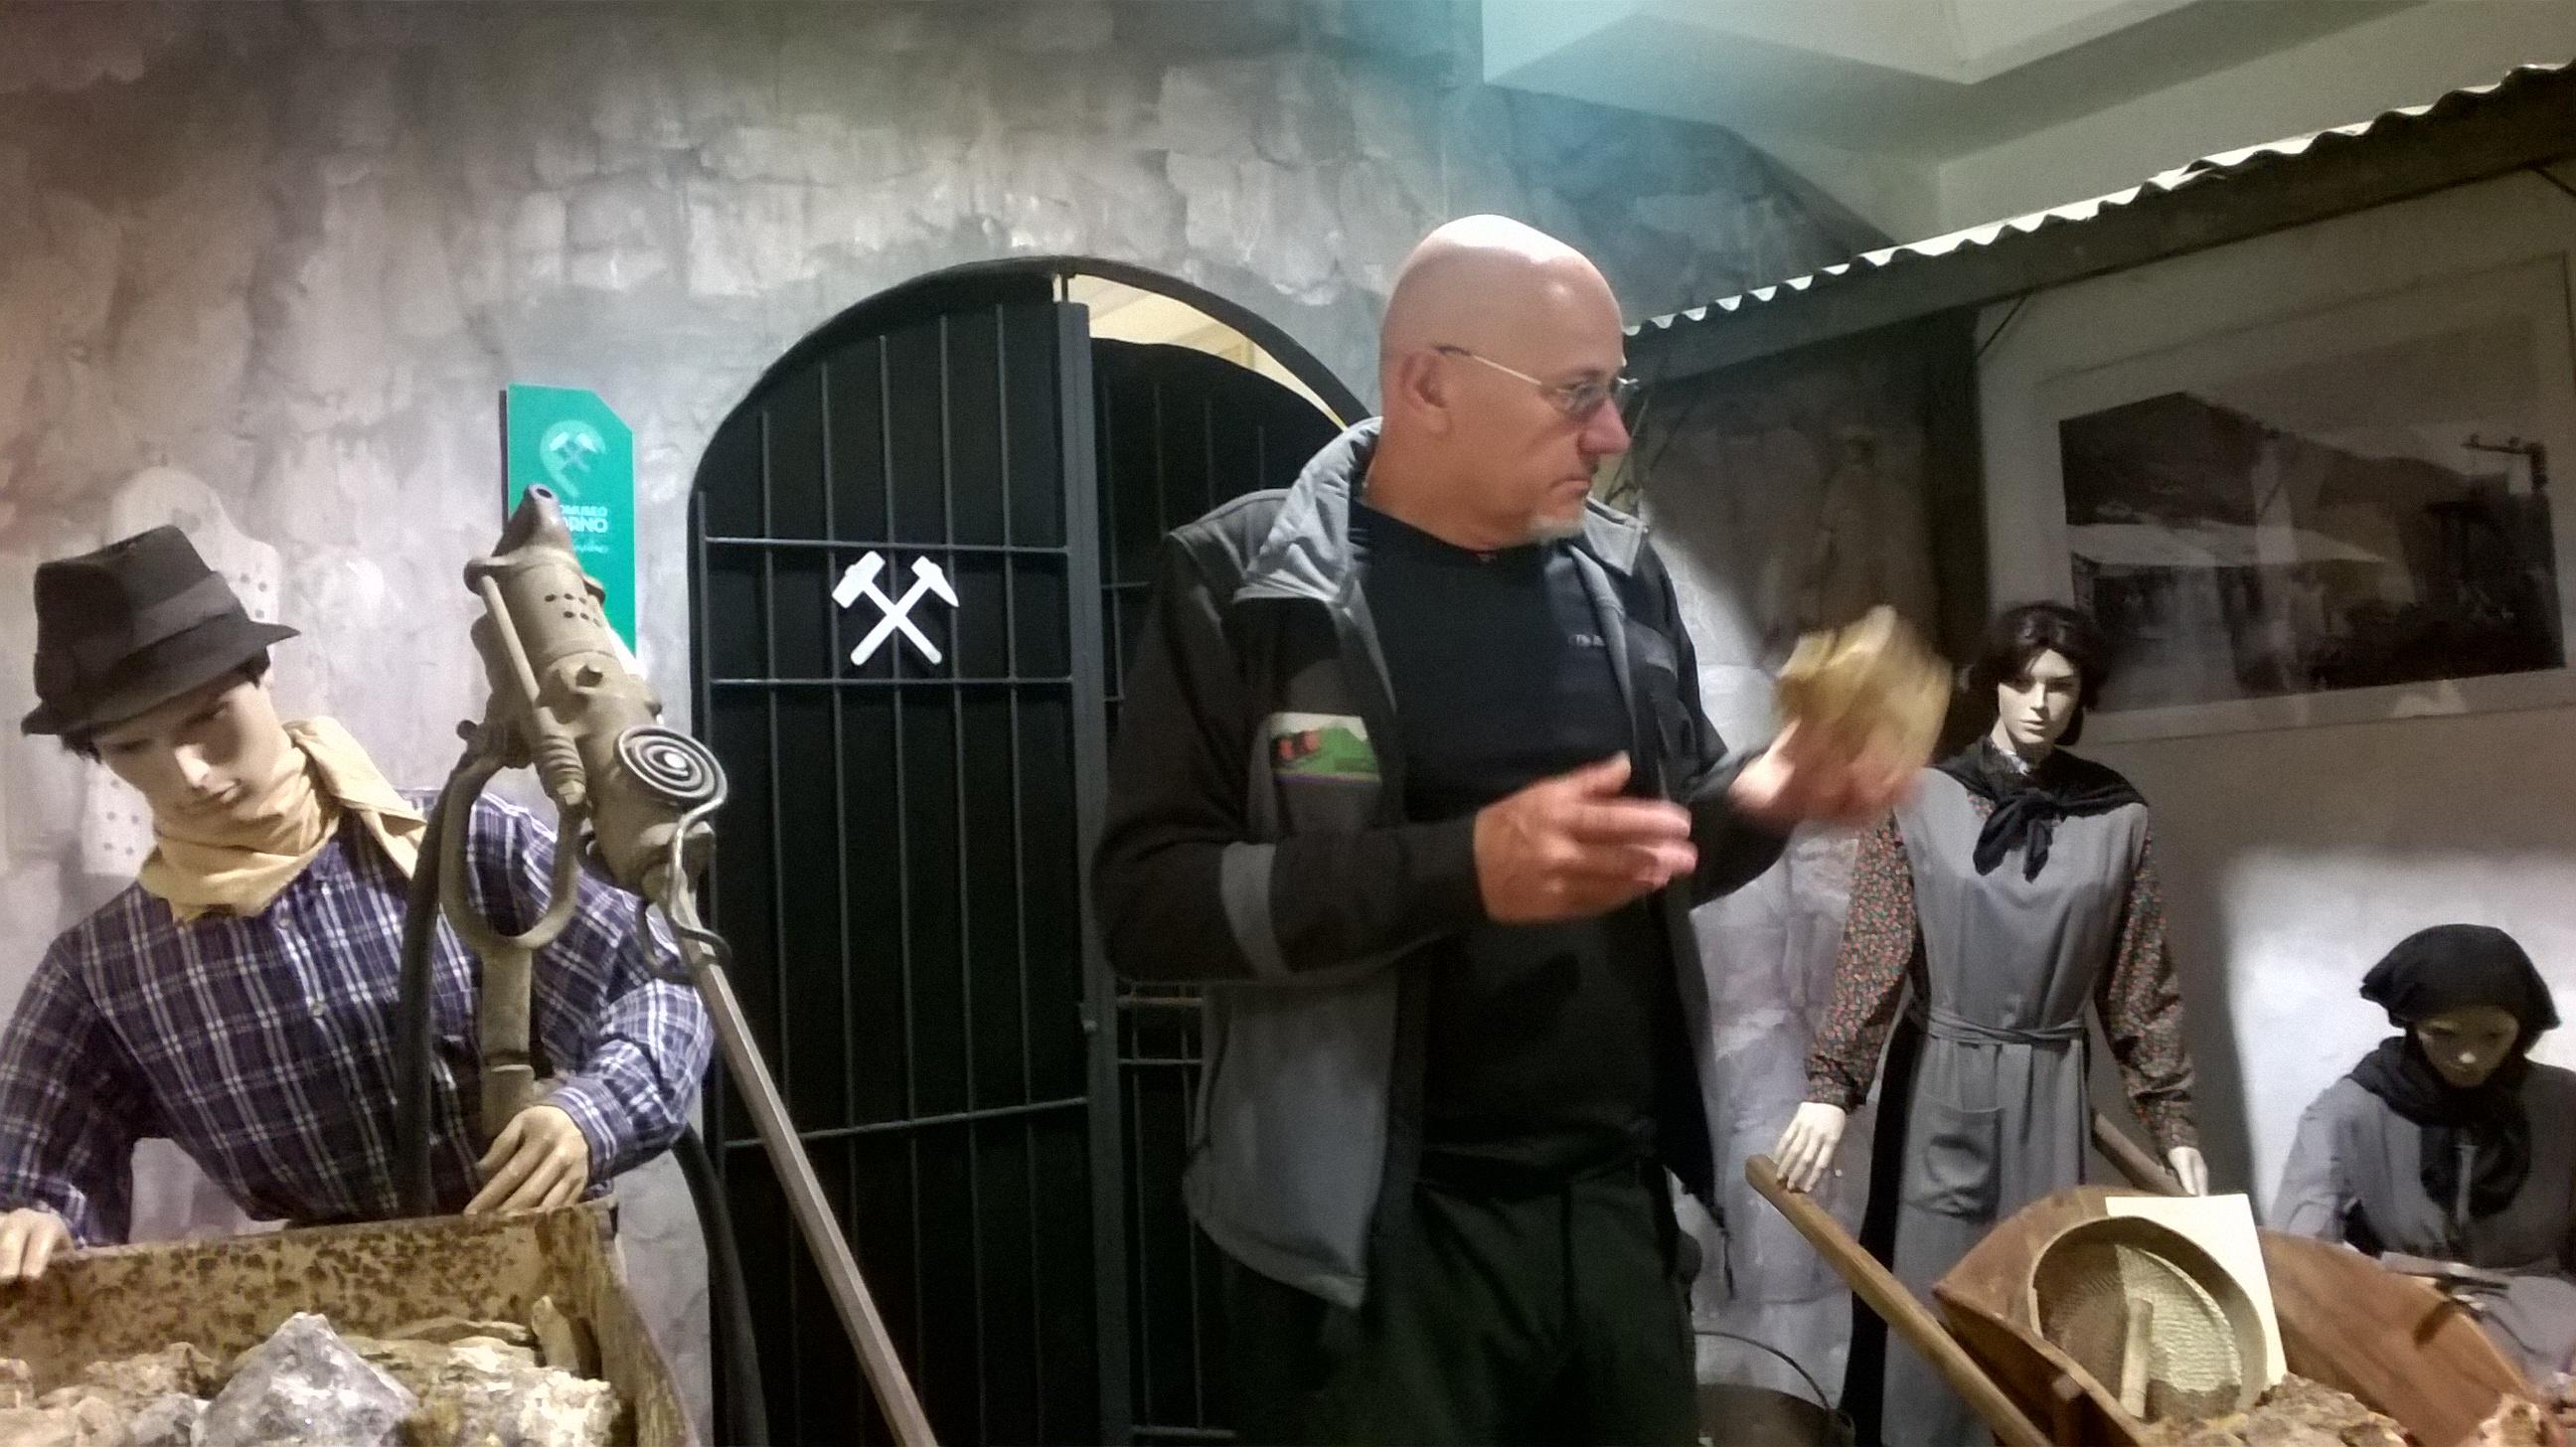 03_ITM 2016 Gorno_visita museo